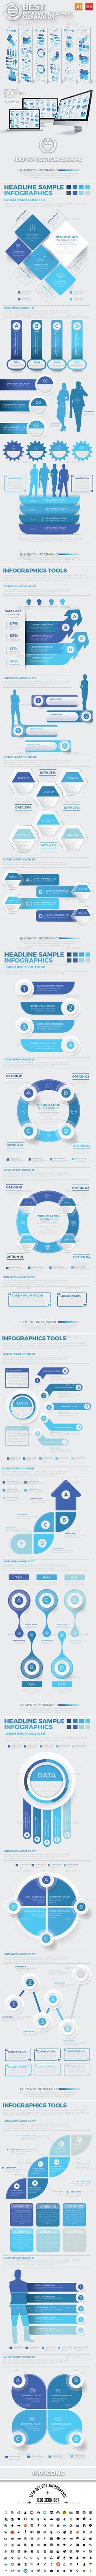 Best Infographics Elements Design Template Vector EPS, AI Illustrator. Download here: https://graphicriver.net/item/best-infographics-elements-design/17057367?ref=ksioks